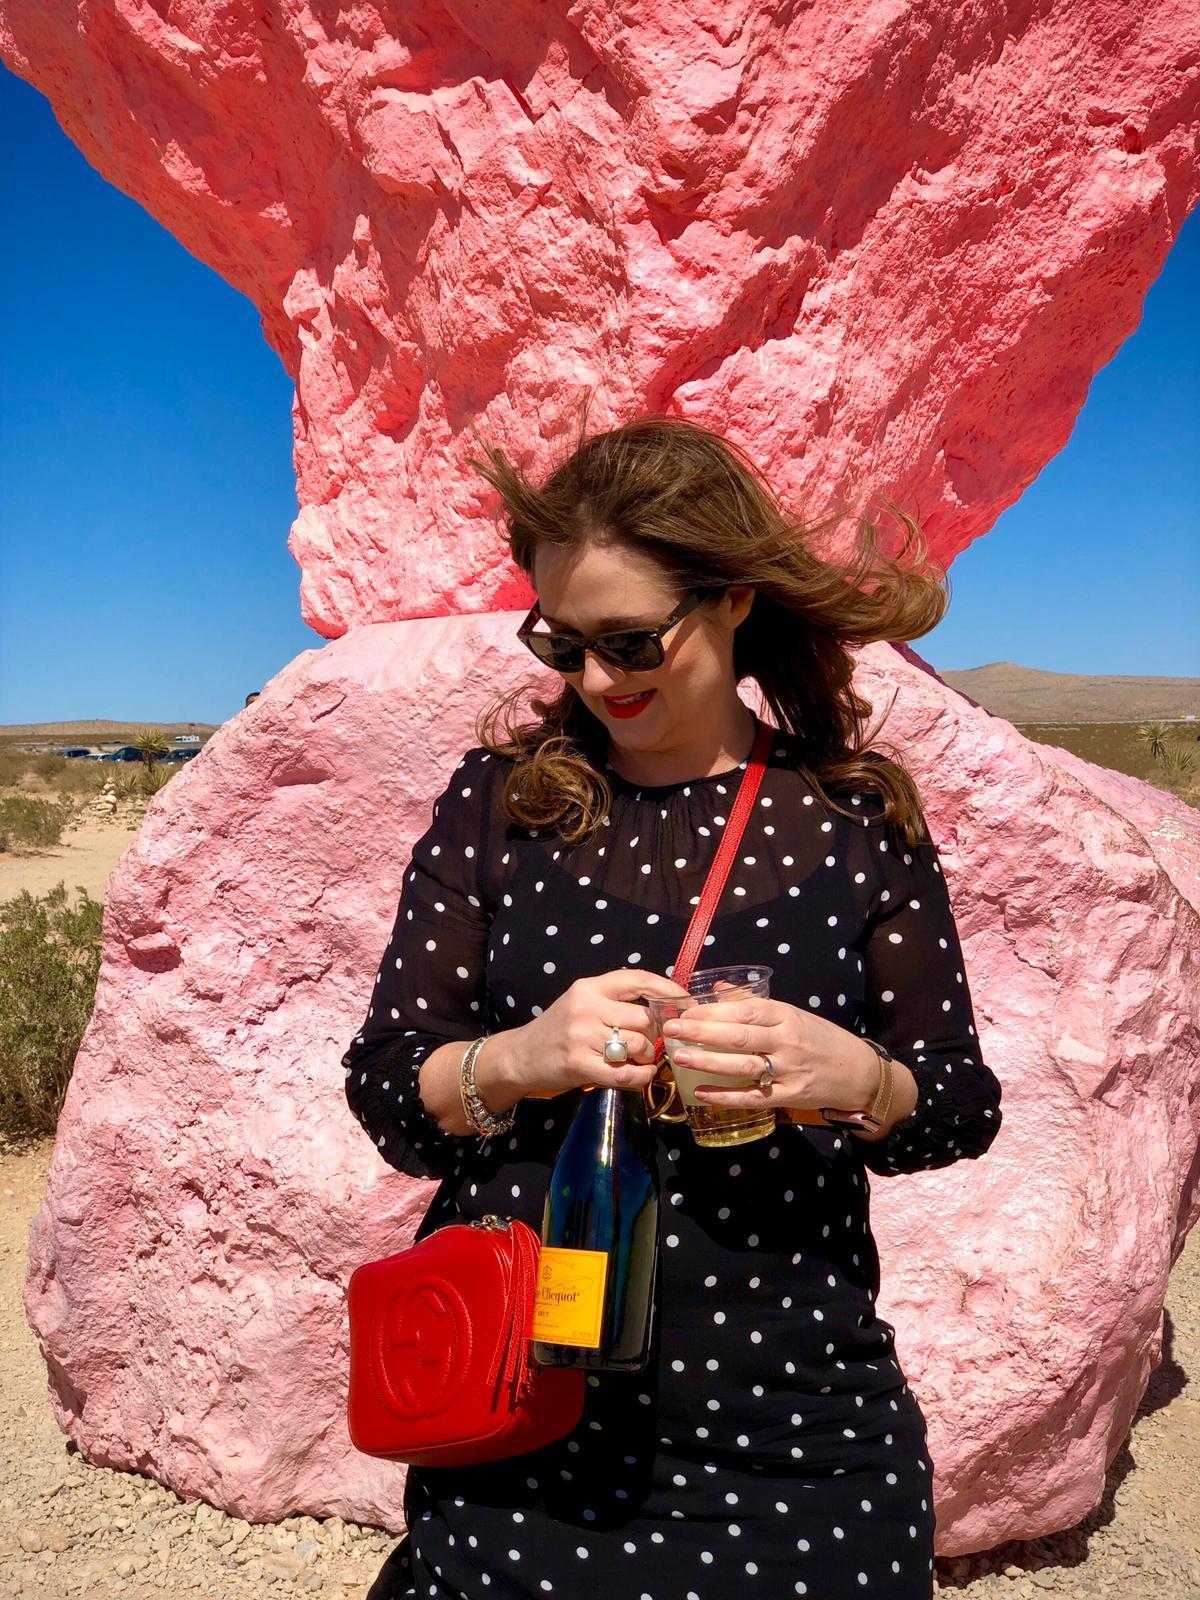 Sarah McGregor's LIA Diary from Las Vegas #2